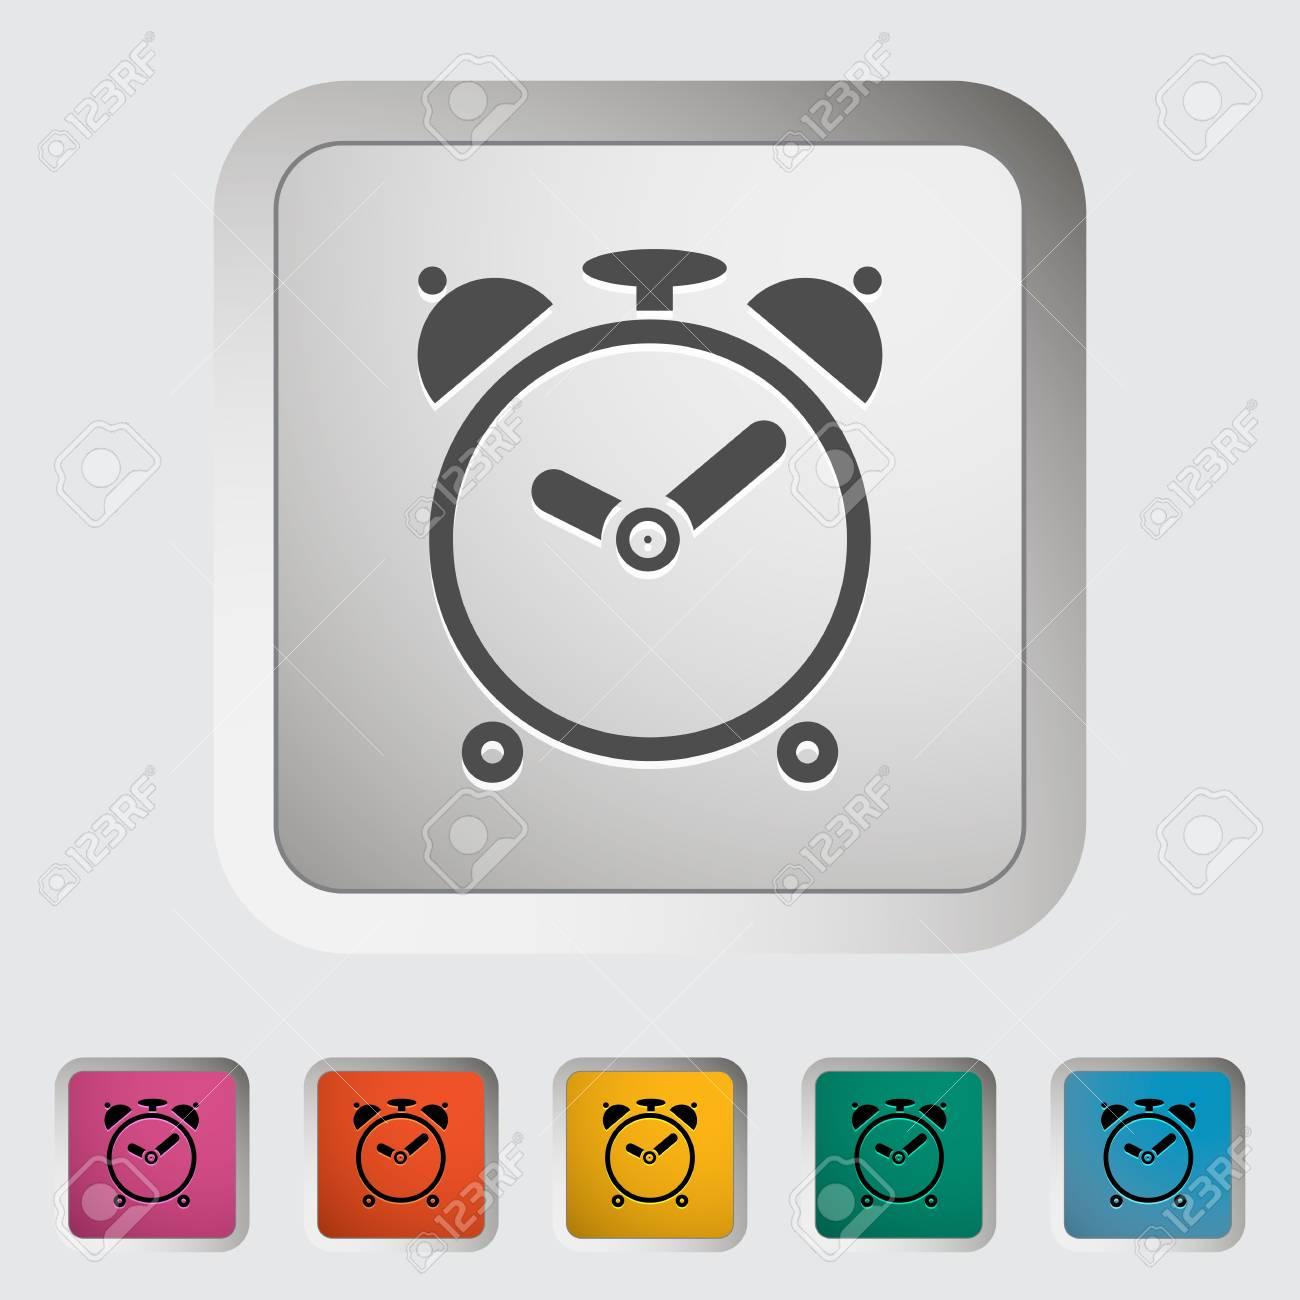 Alarm clock. Single icon. Vector illustration.. Stock Photo - 21190643